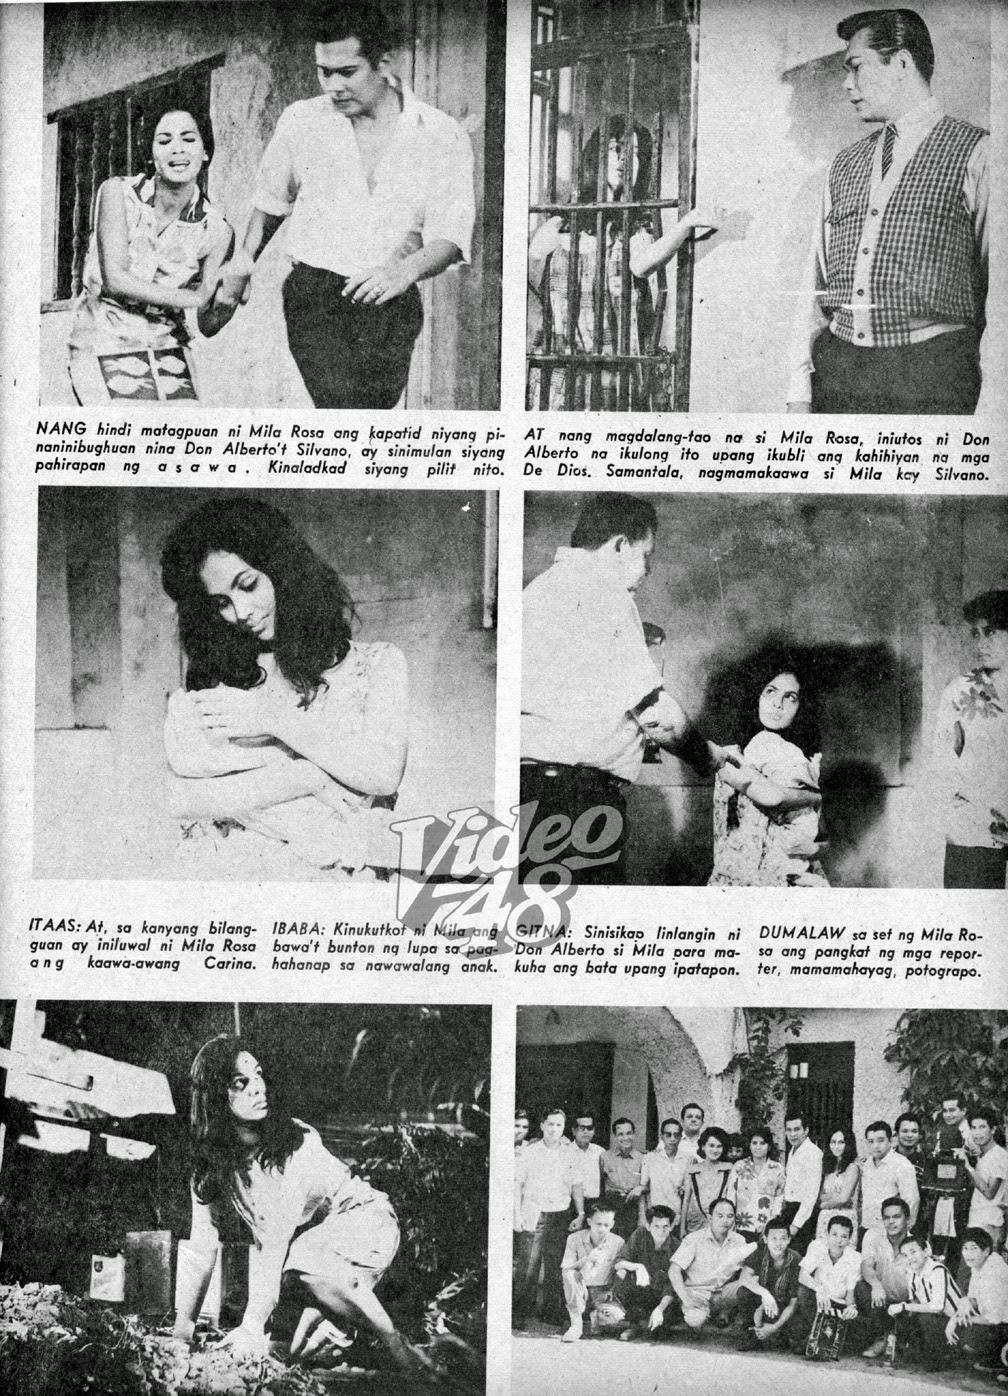 Sue Sally Hale Legendary American Polo Pioneer, broke the gender barrier in Polo.,Tatyana M. Ali born January 24, 1979 (age 39) Adult photos Nola Fairbanks,Terrie Waddell